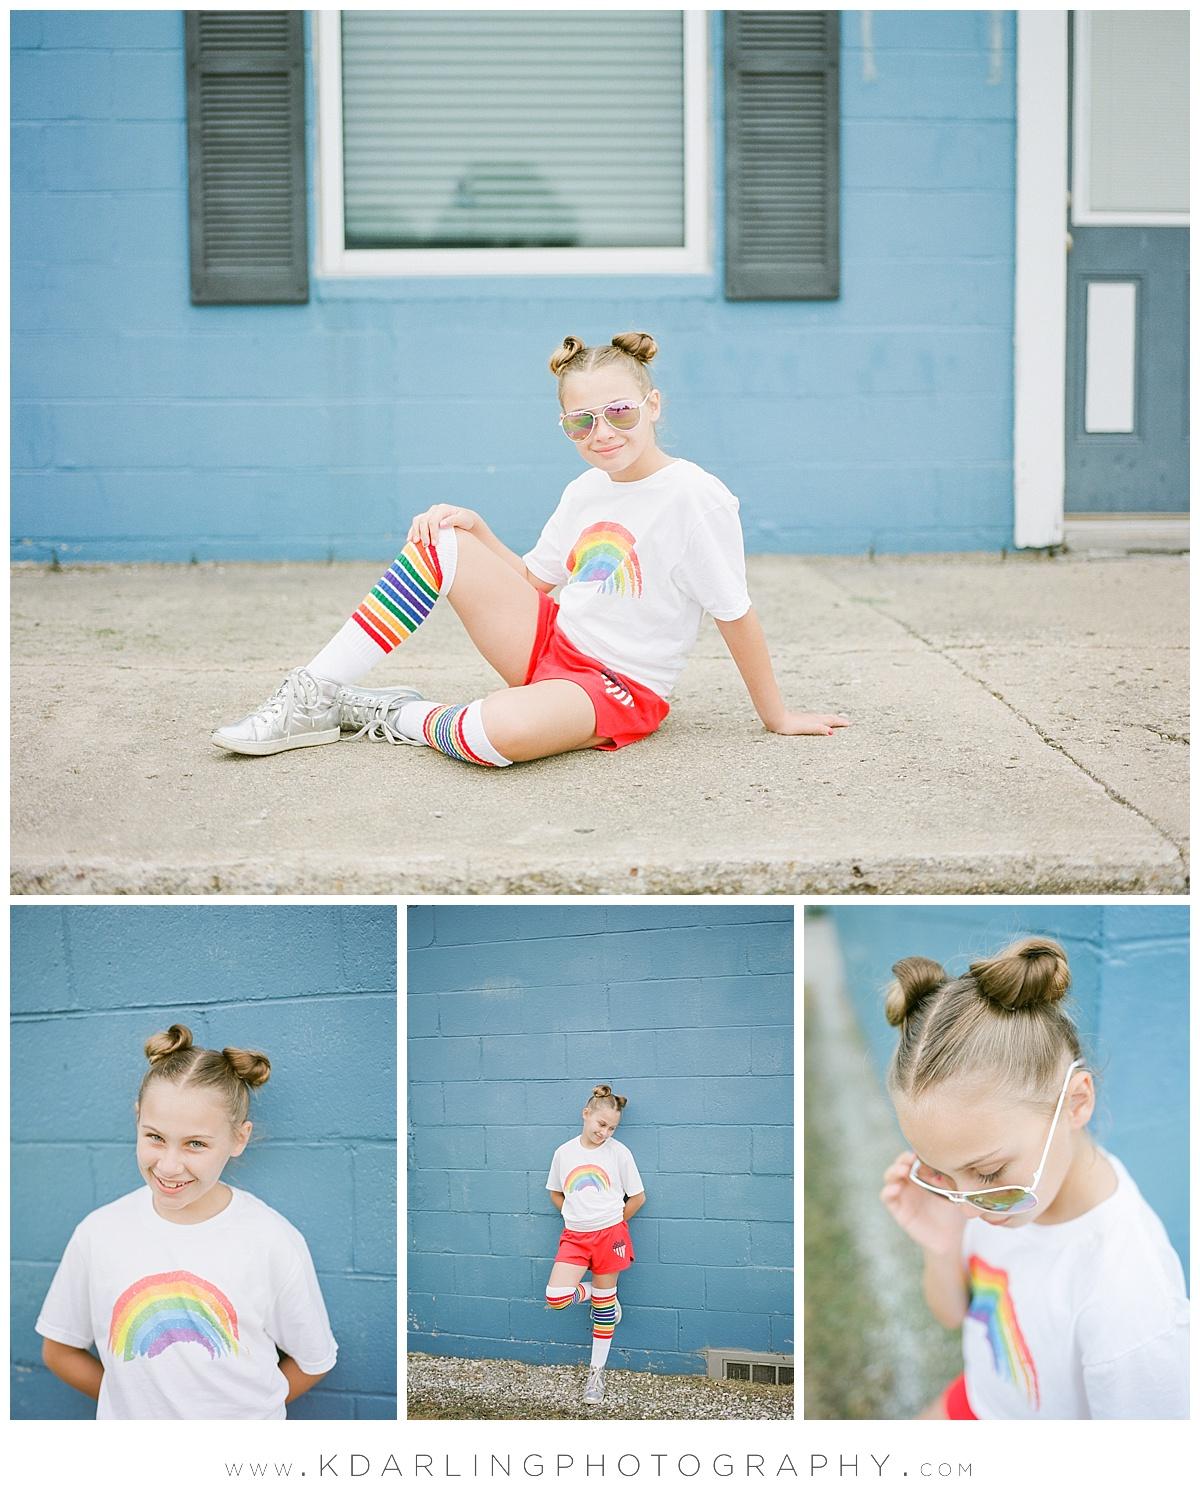 Central-illinois-Photographer-child-film-photography-Champaign-mamiya-fuji-rainbow-back-to-school-session_0427.jpg